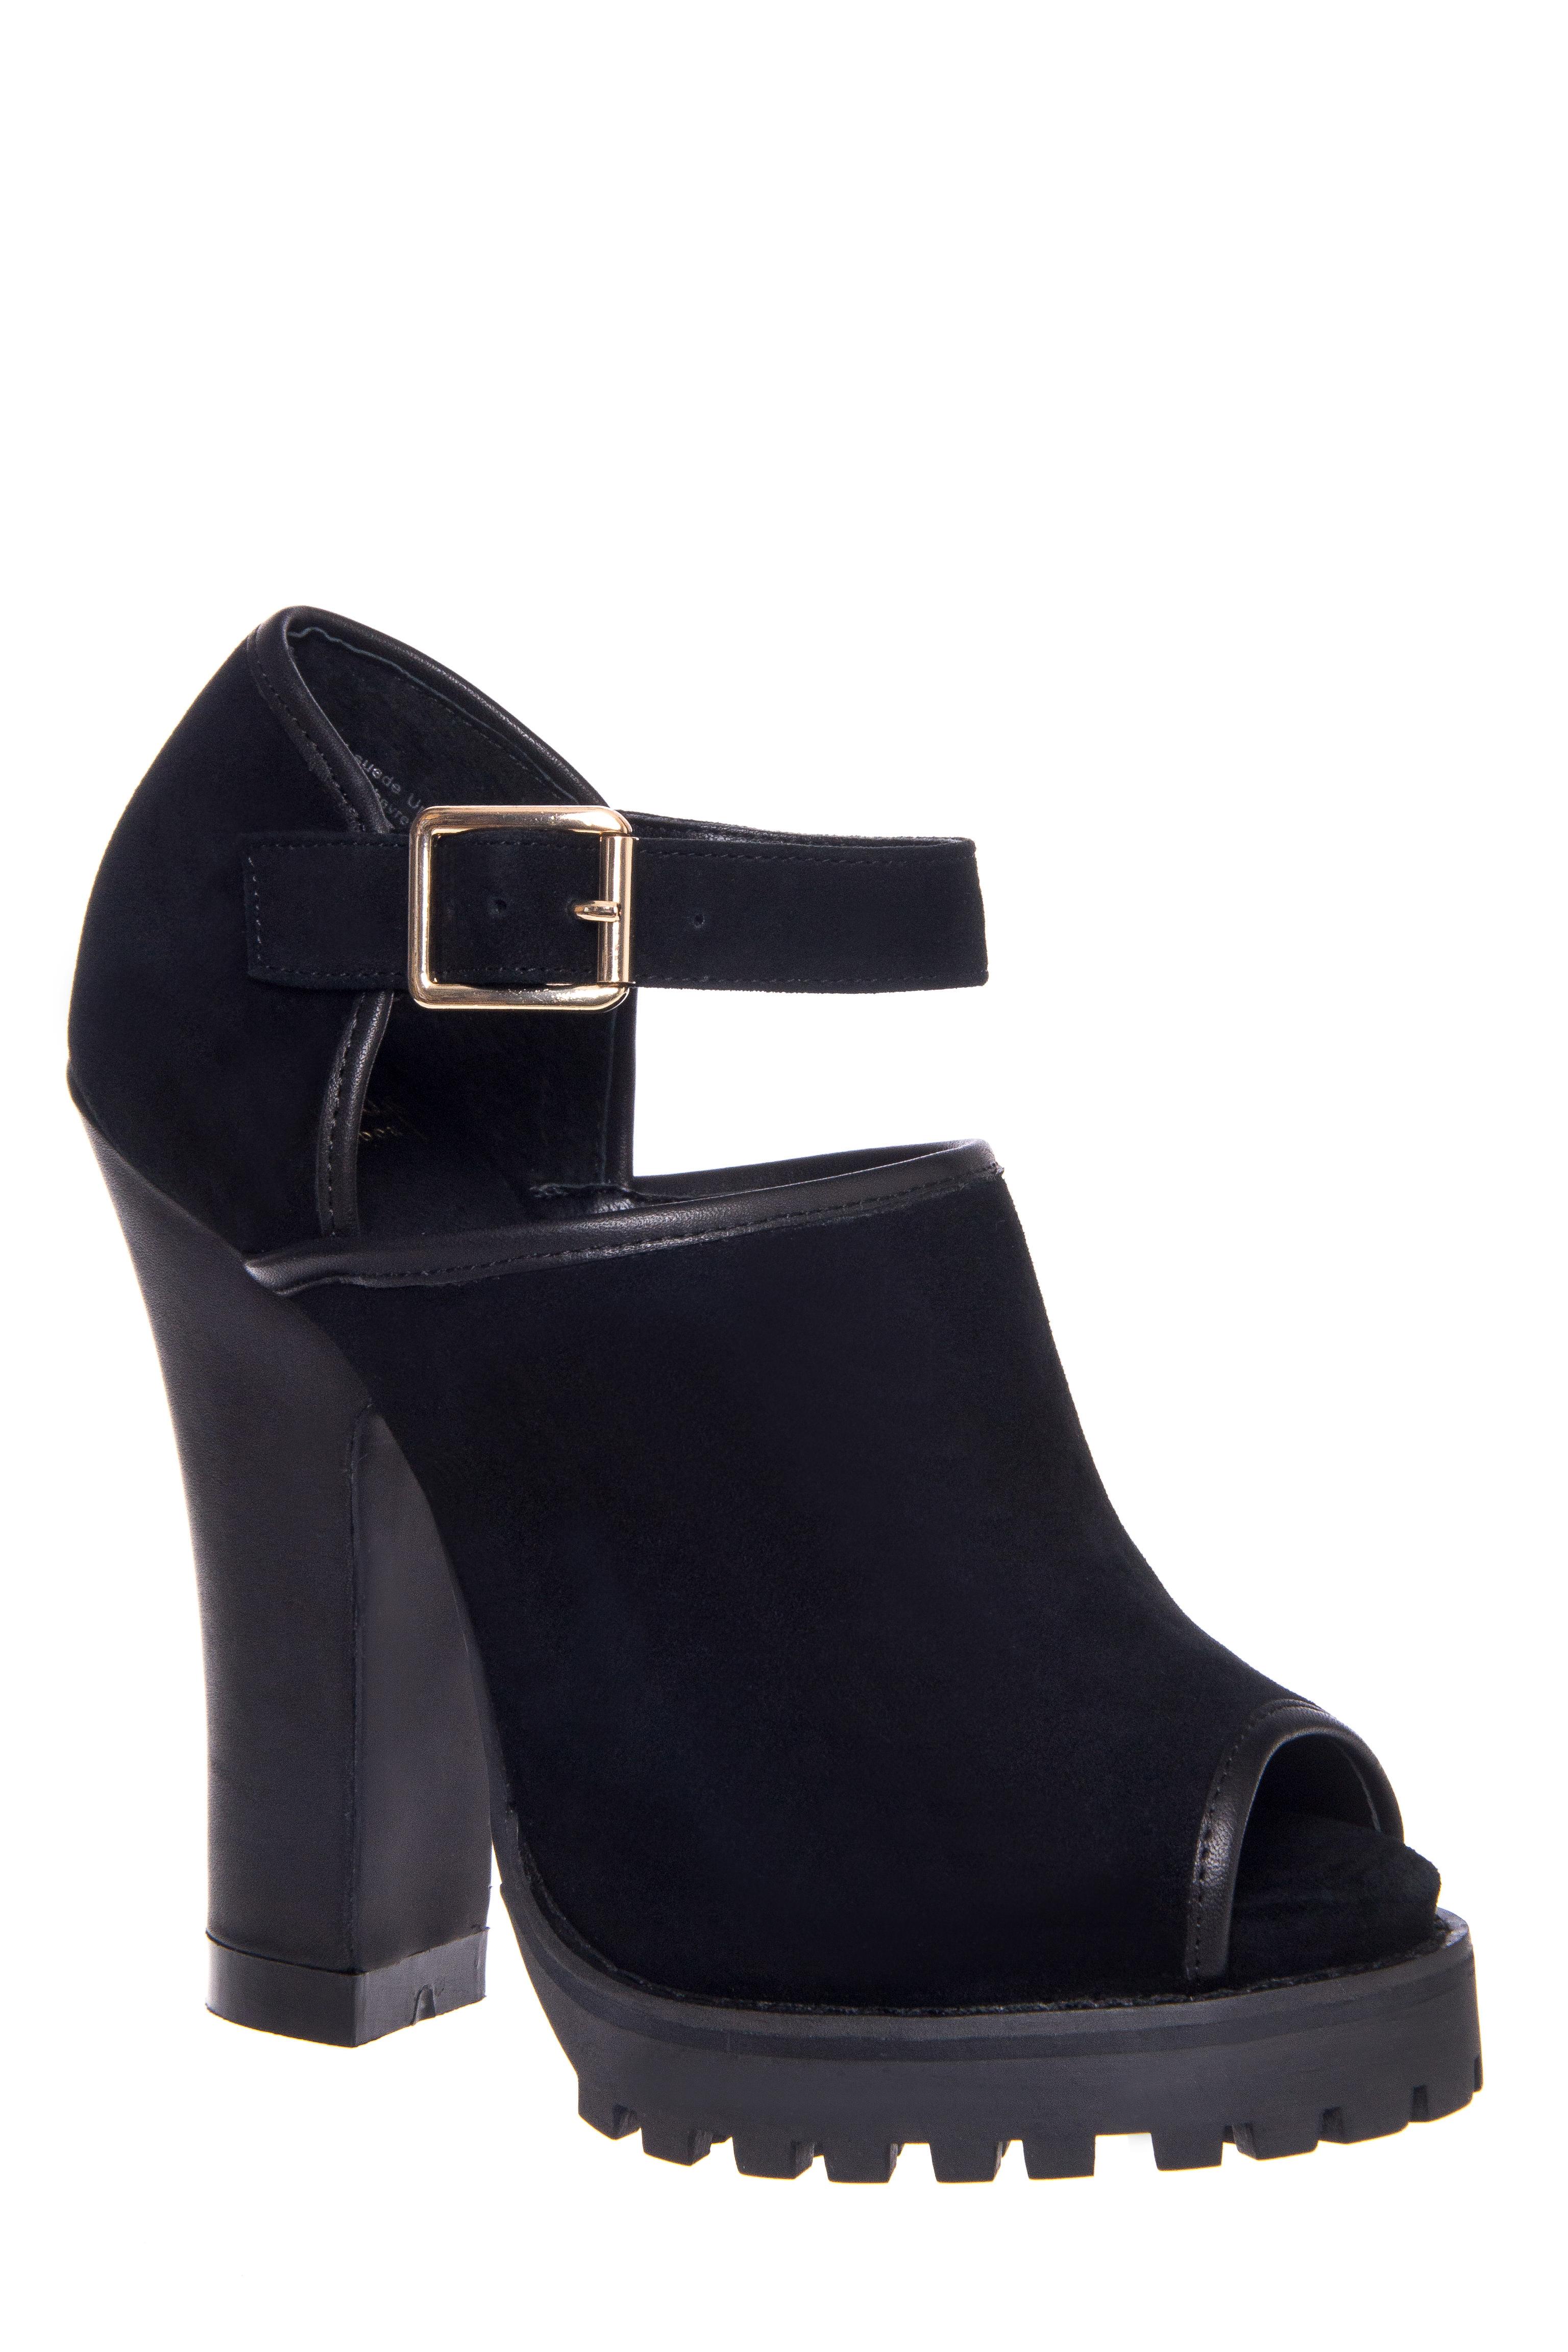 Shellys London Acywen High Heel Pumps - Black Suede